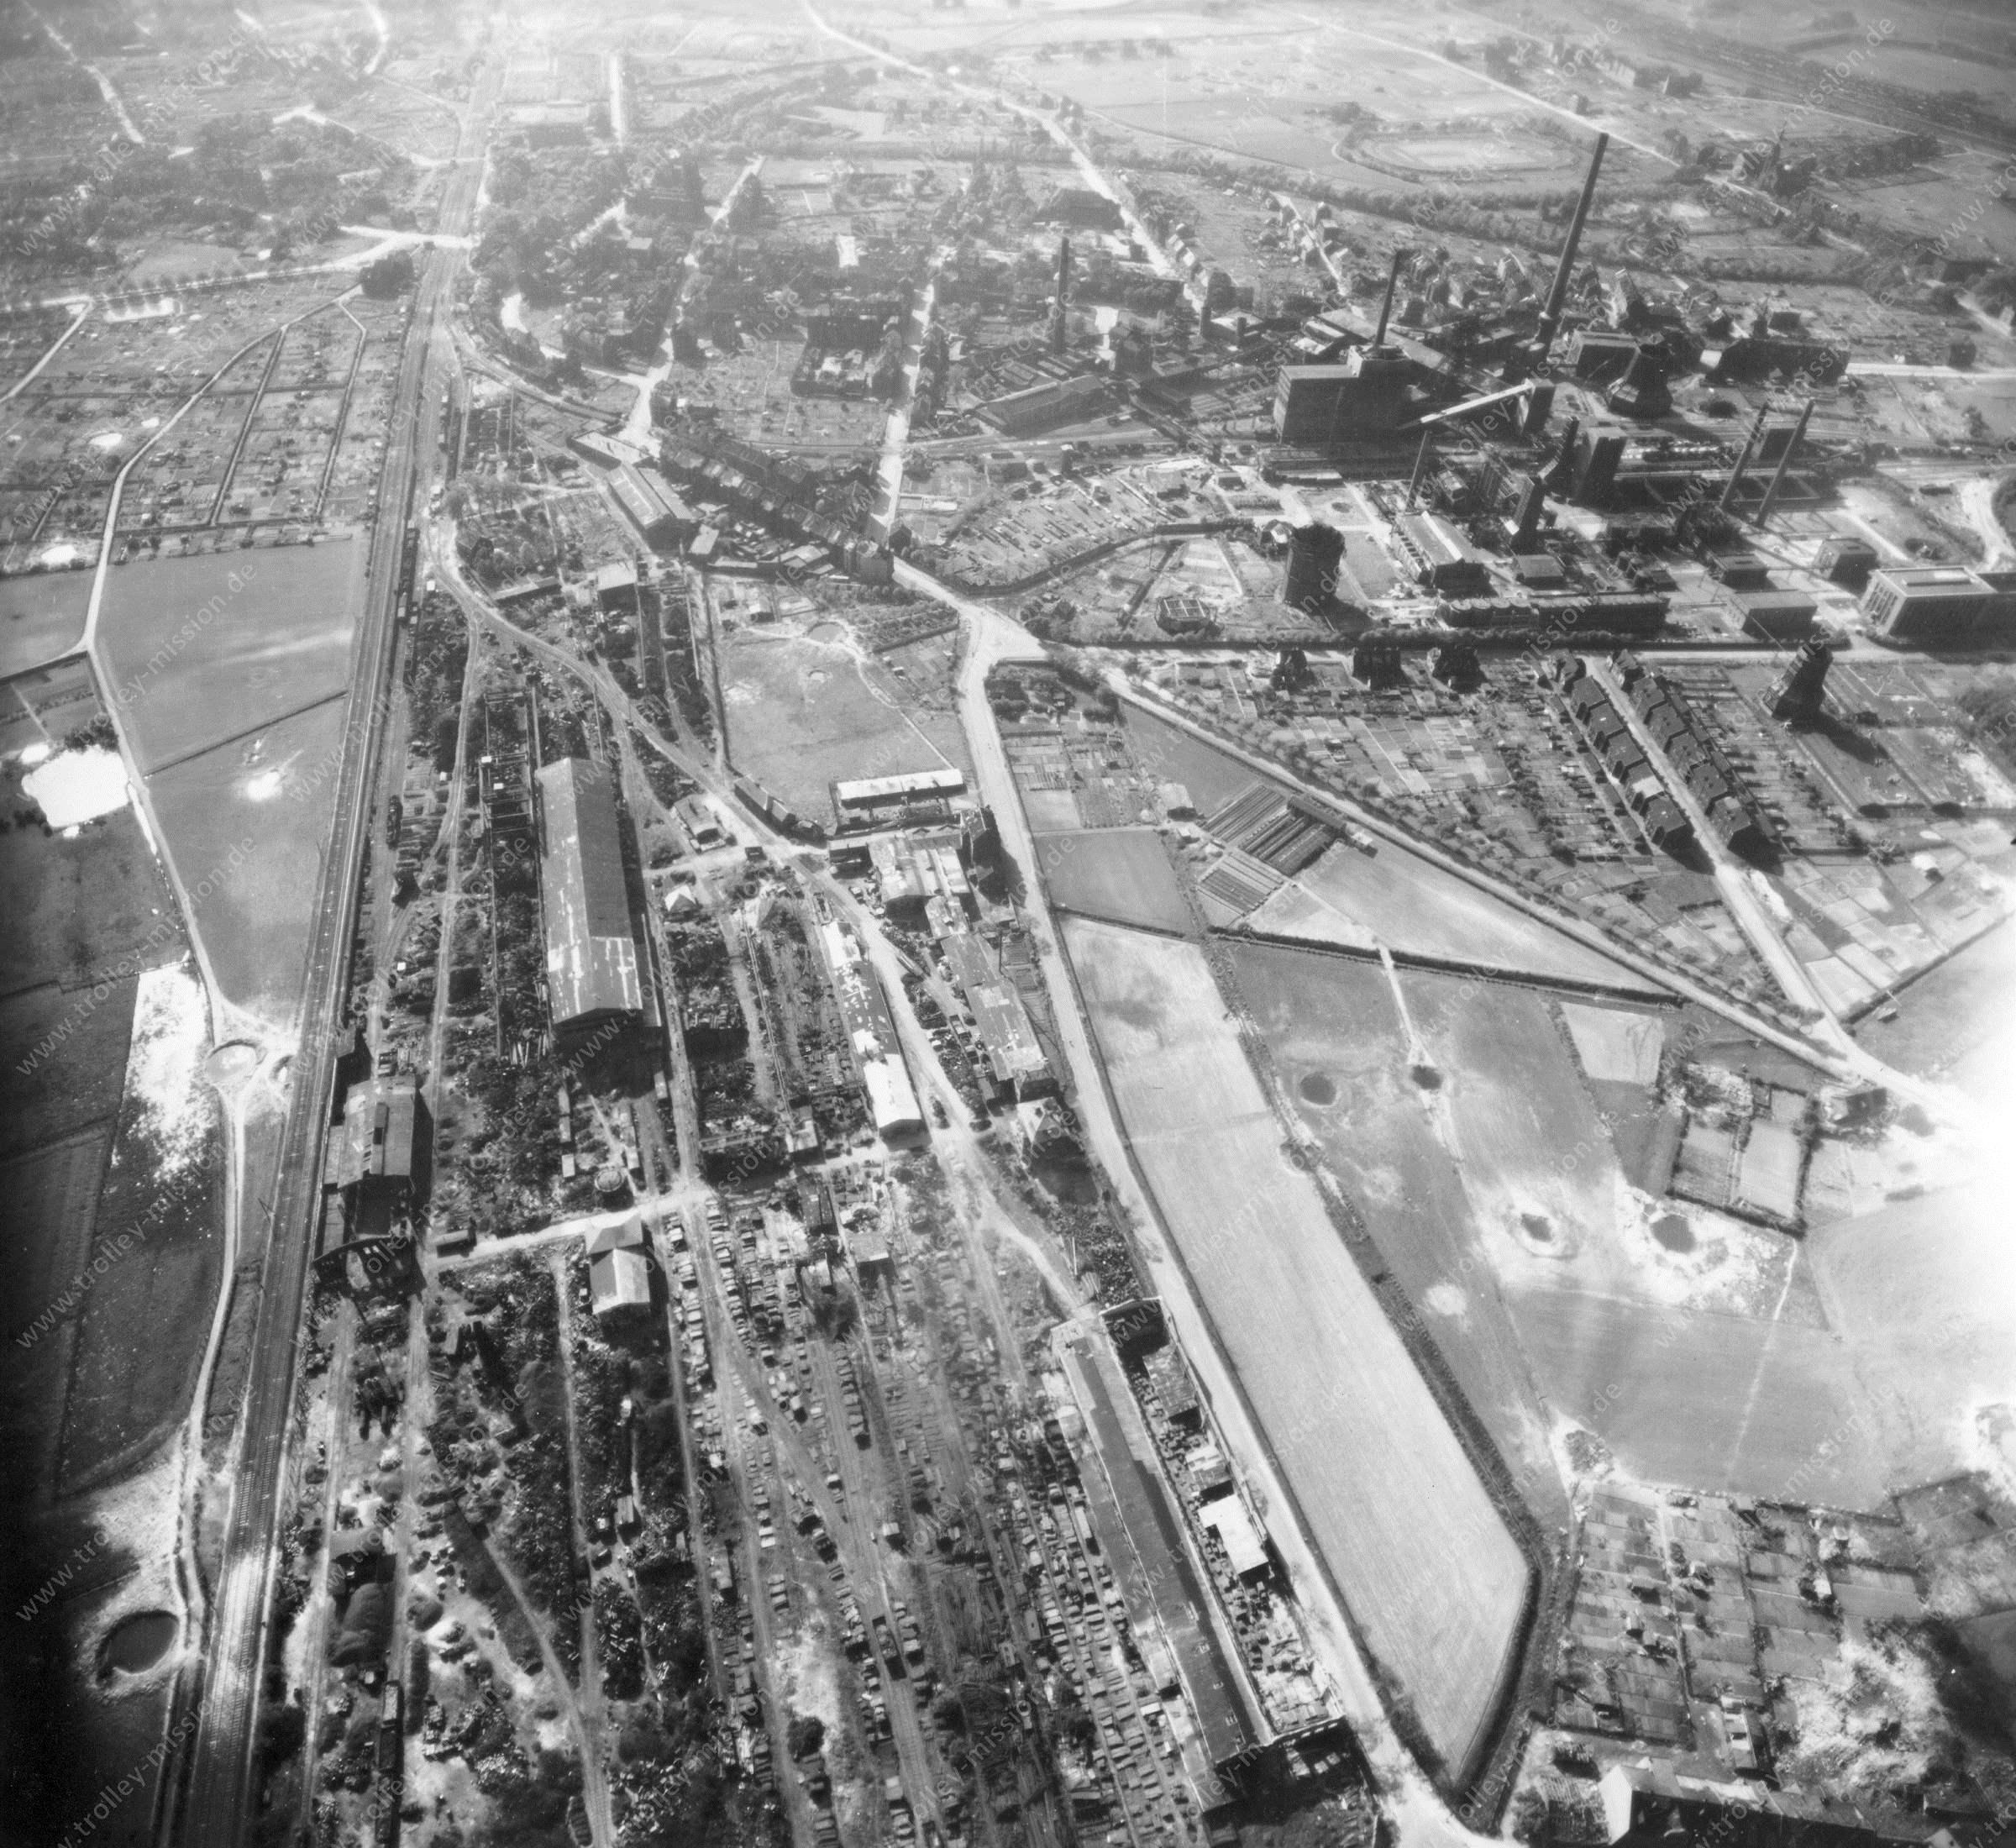 Gelsenkirchen Luftbild Zeche Consolidation im Stadtteil Bismarck